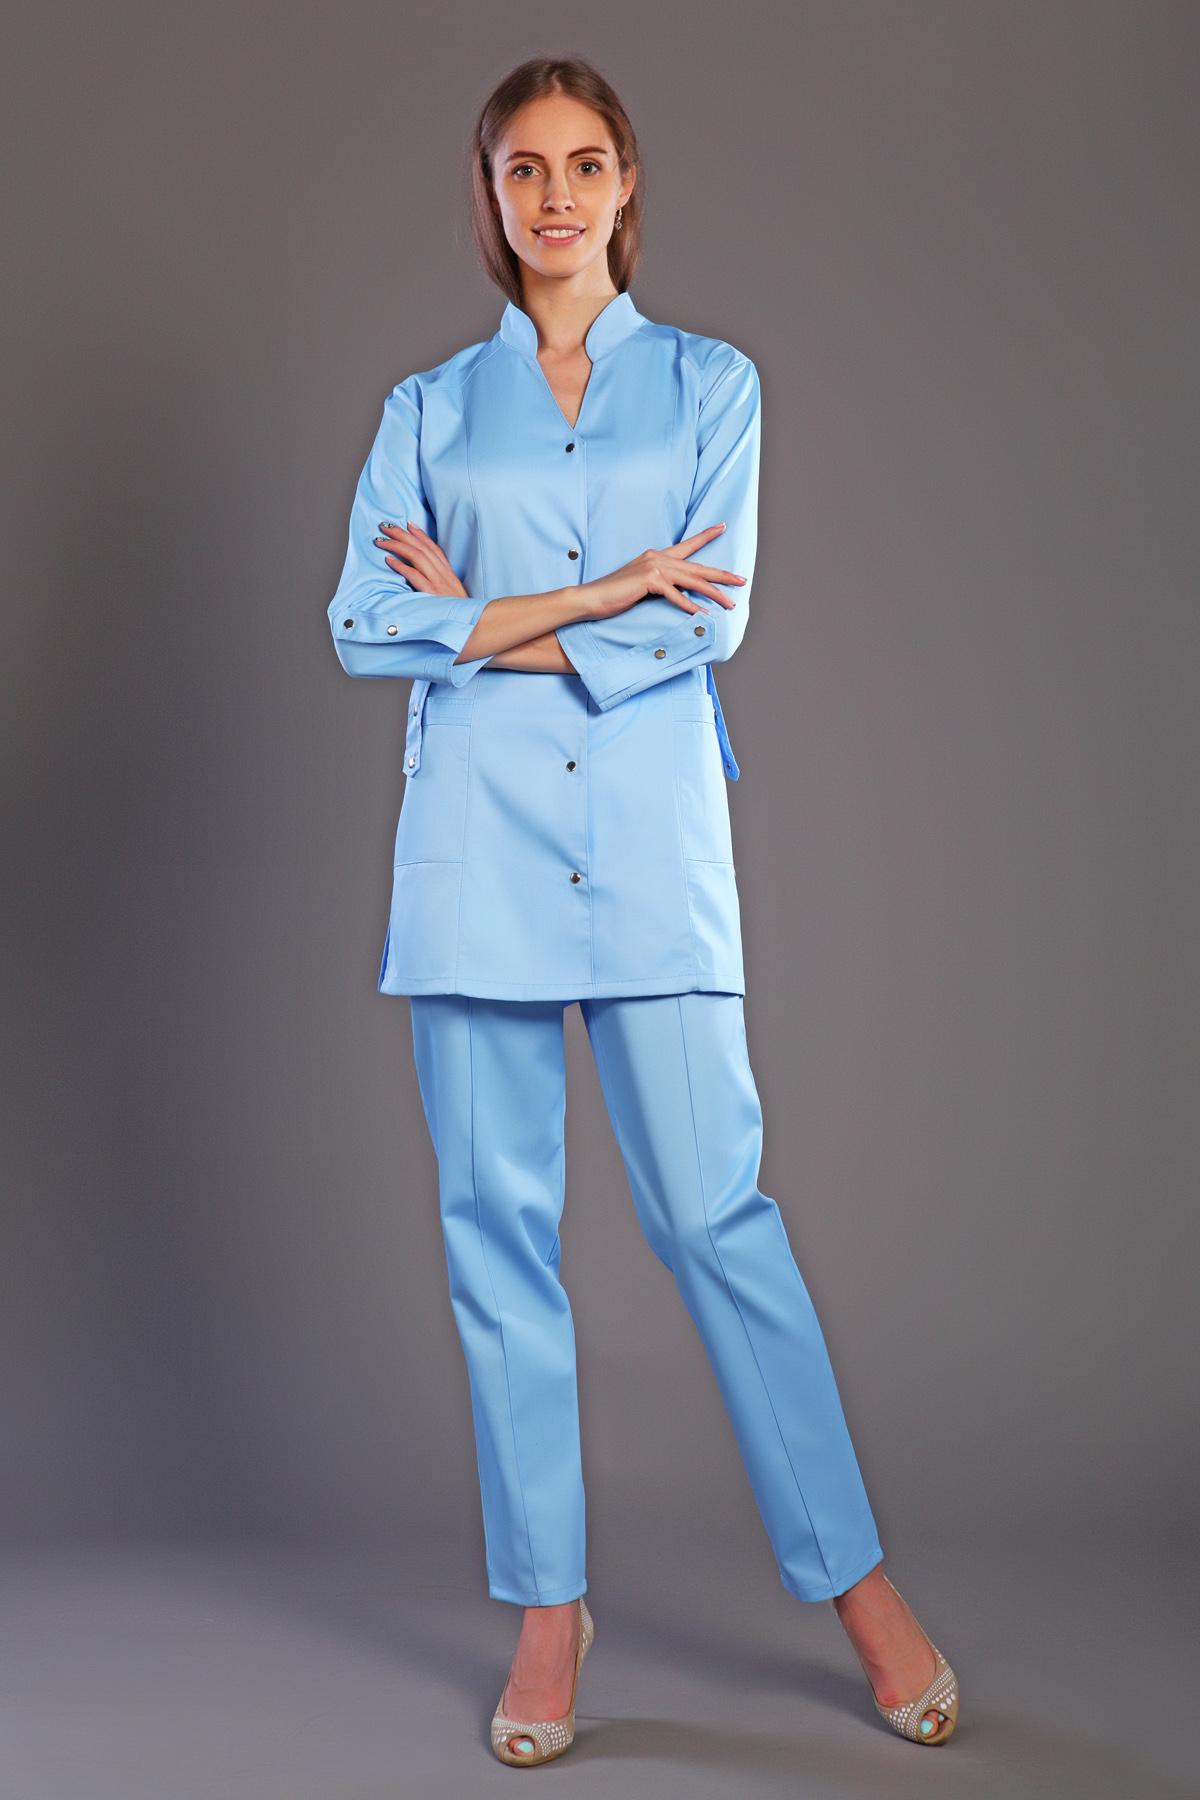 Костюм медицинский женский М-121 ТвилКостюмы, кофты, брюки<br><br><br>Размер: 54